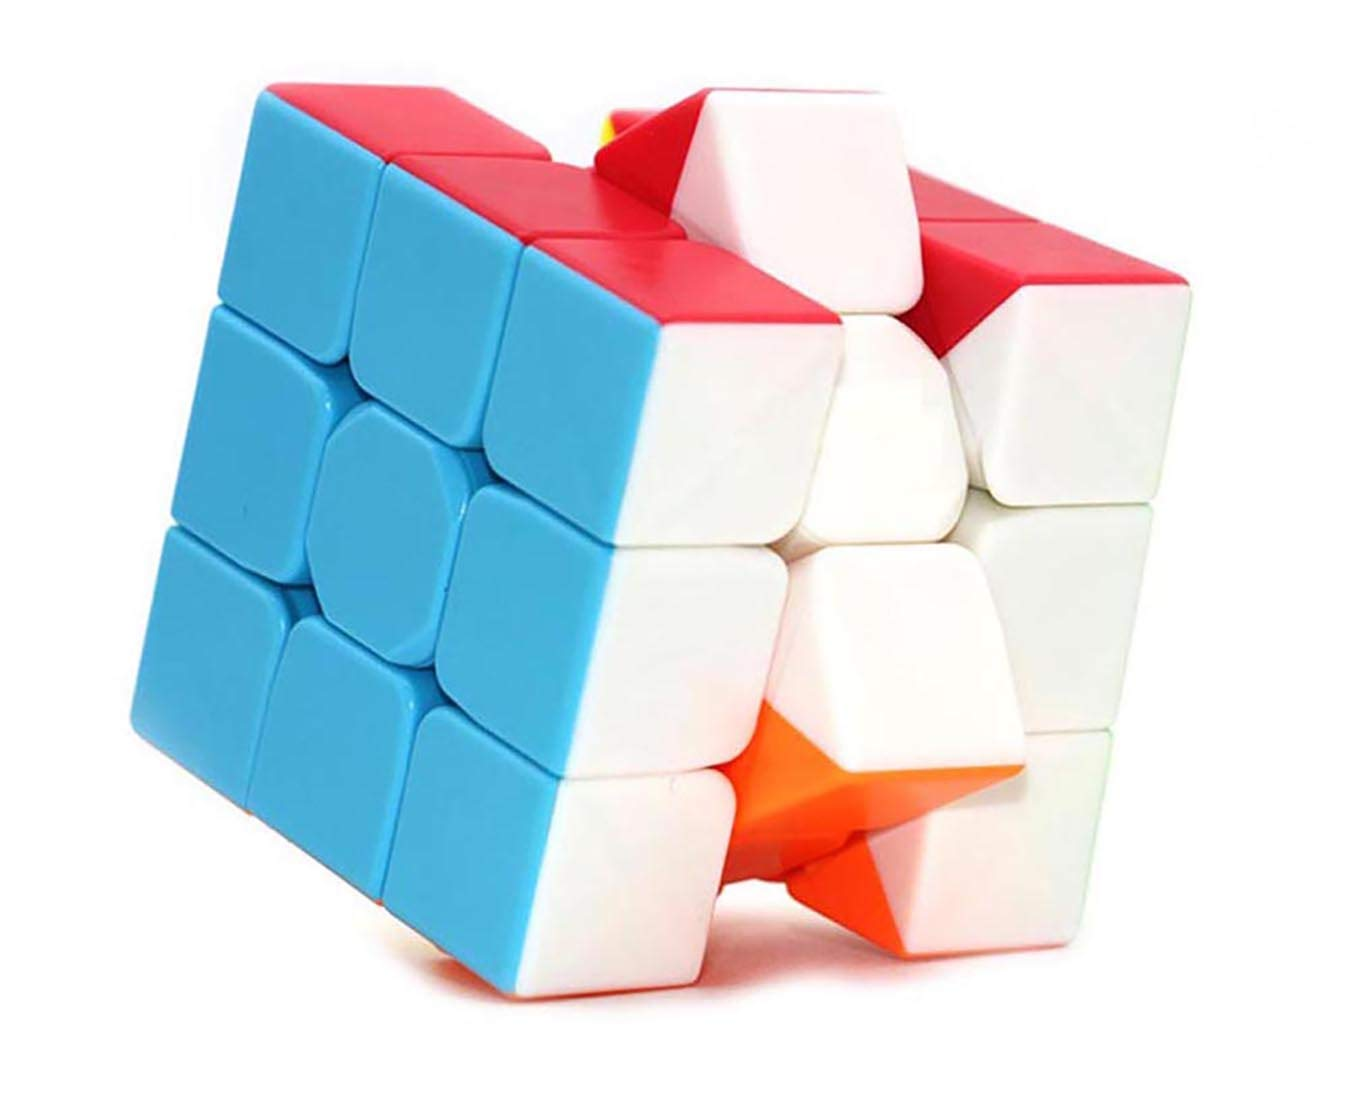 UNLOCKGIFT 2x2x2 bis 11x11x11 Magic Cube Speed Cube Stickerless Puzzle Spielzeug B07P655DWX 3D-Puzzles Bunt,   | Modisch